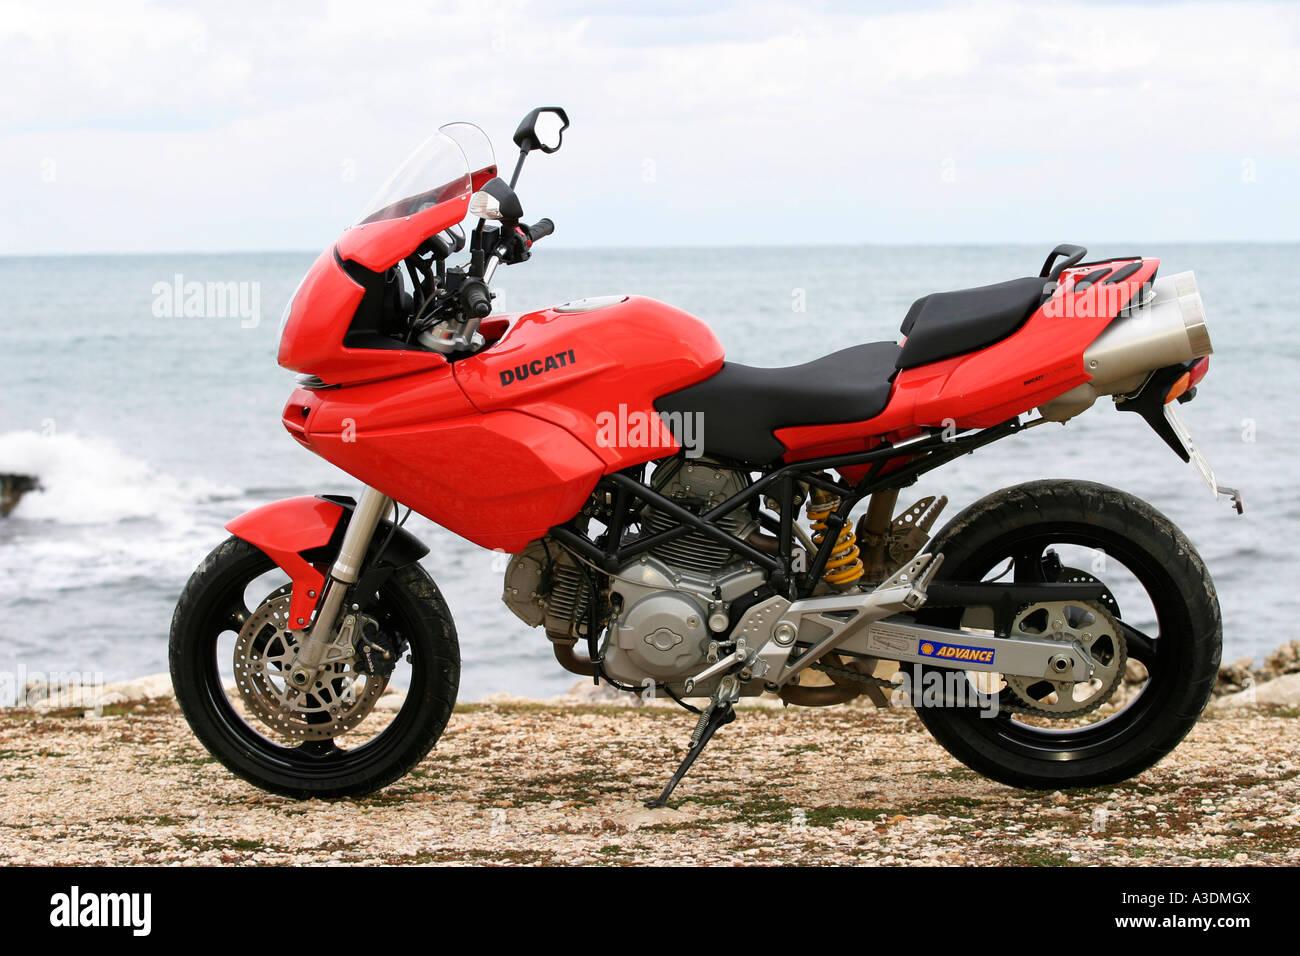 Ducati Multistrada on the beach - Stock Image